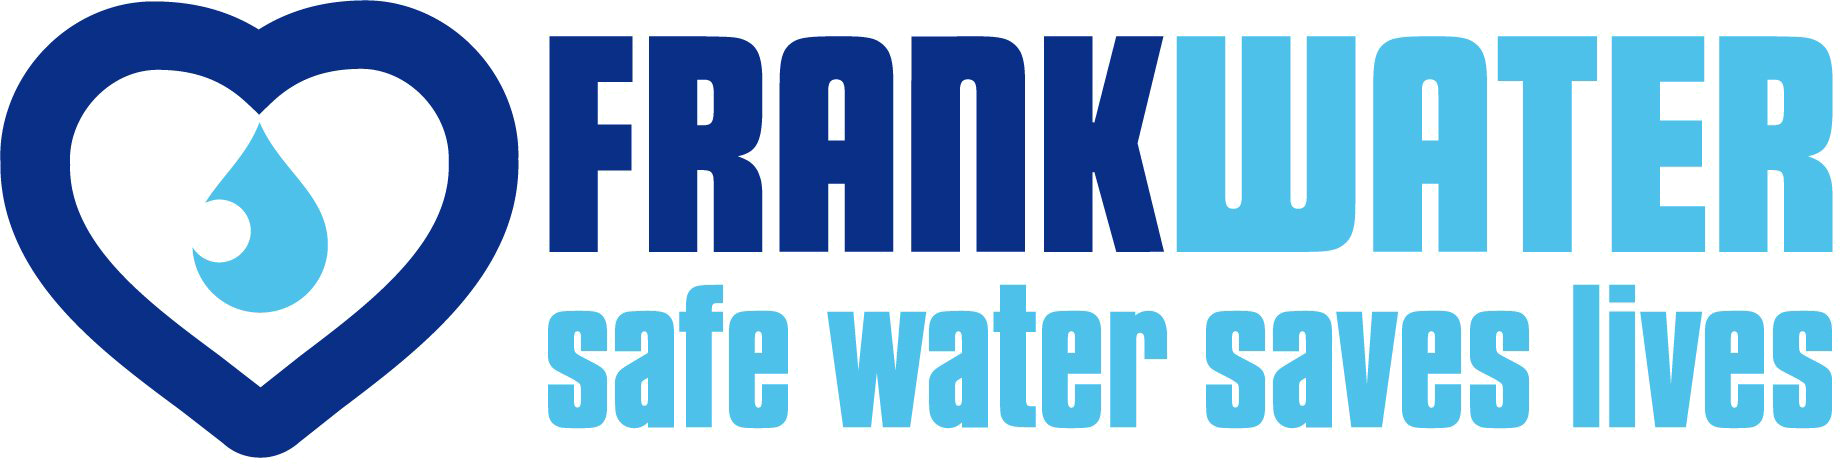 2017-Horizontal-Logo_FrankTransp.png